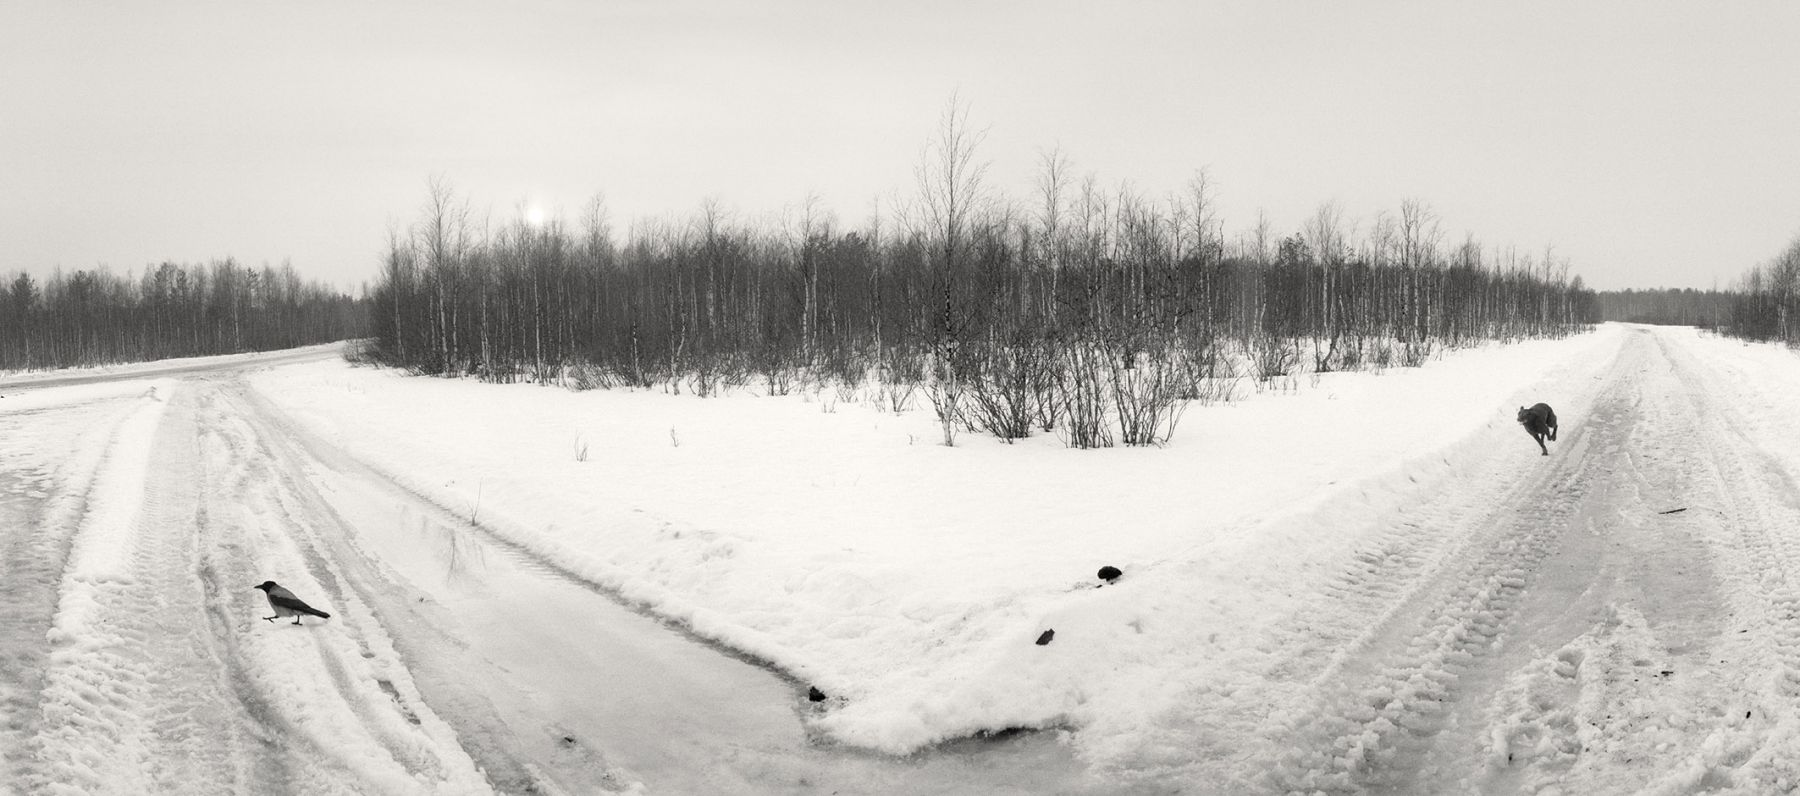 Paanajärvi, Karelia, Russia